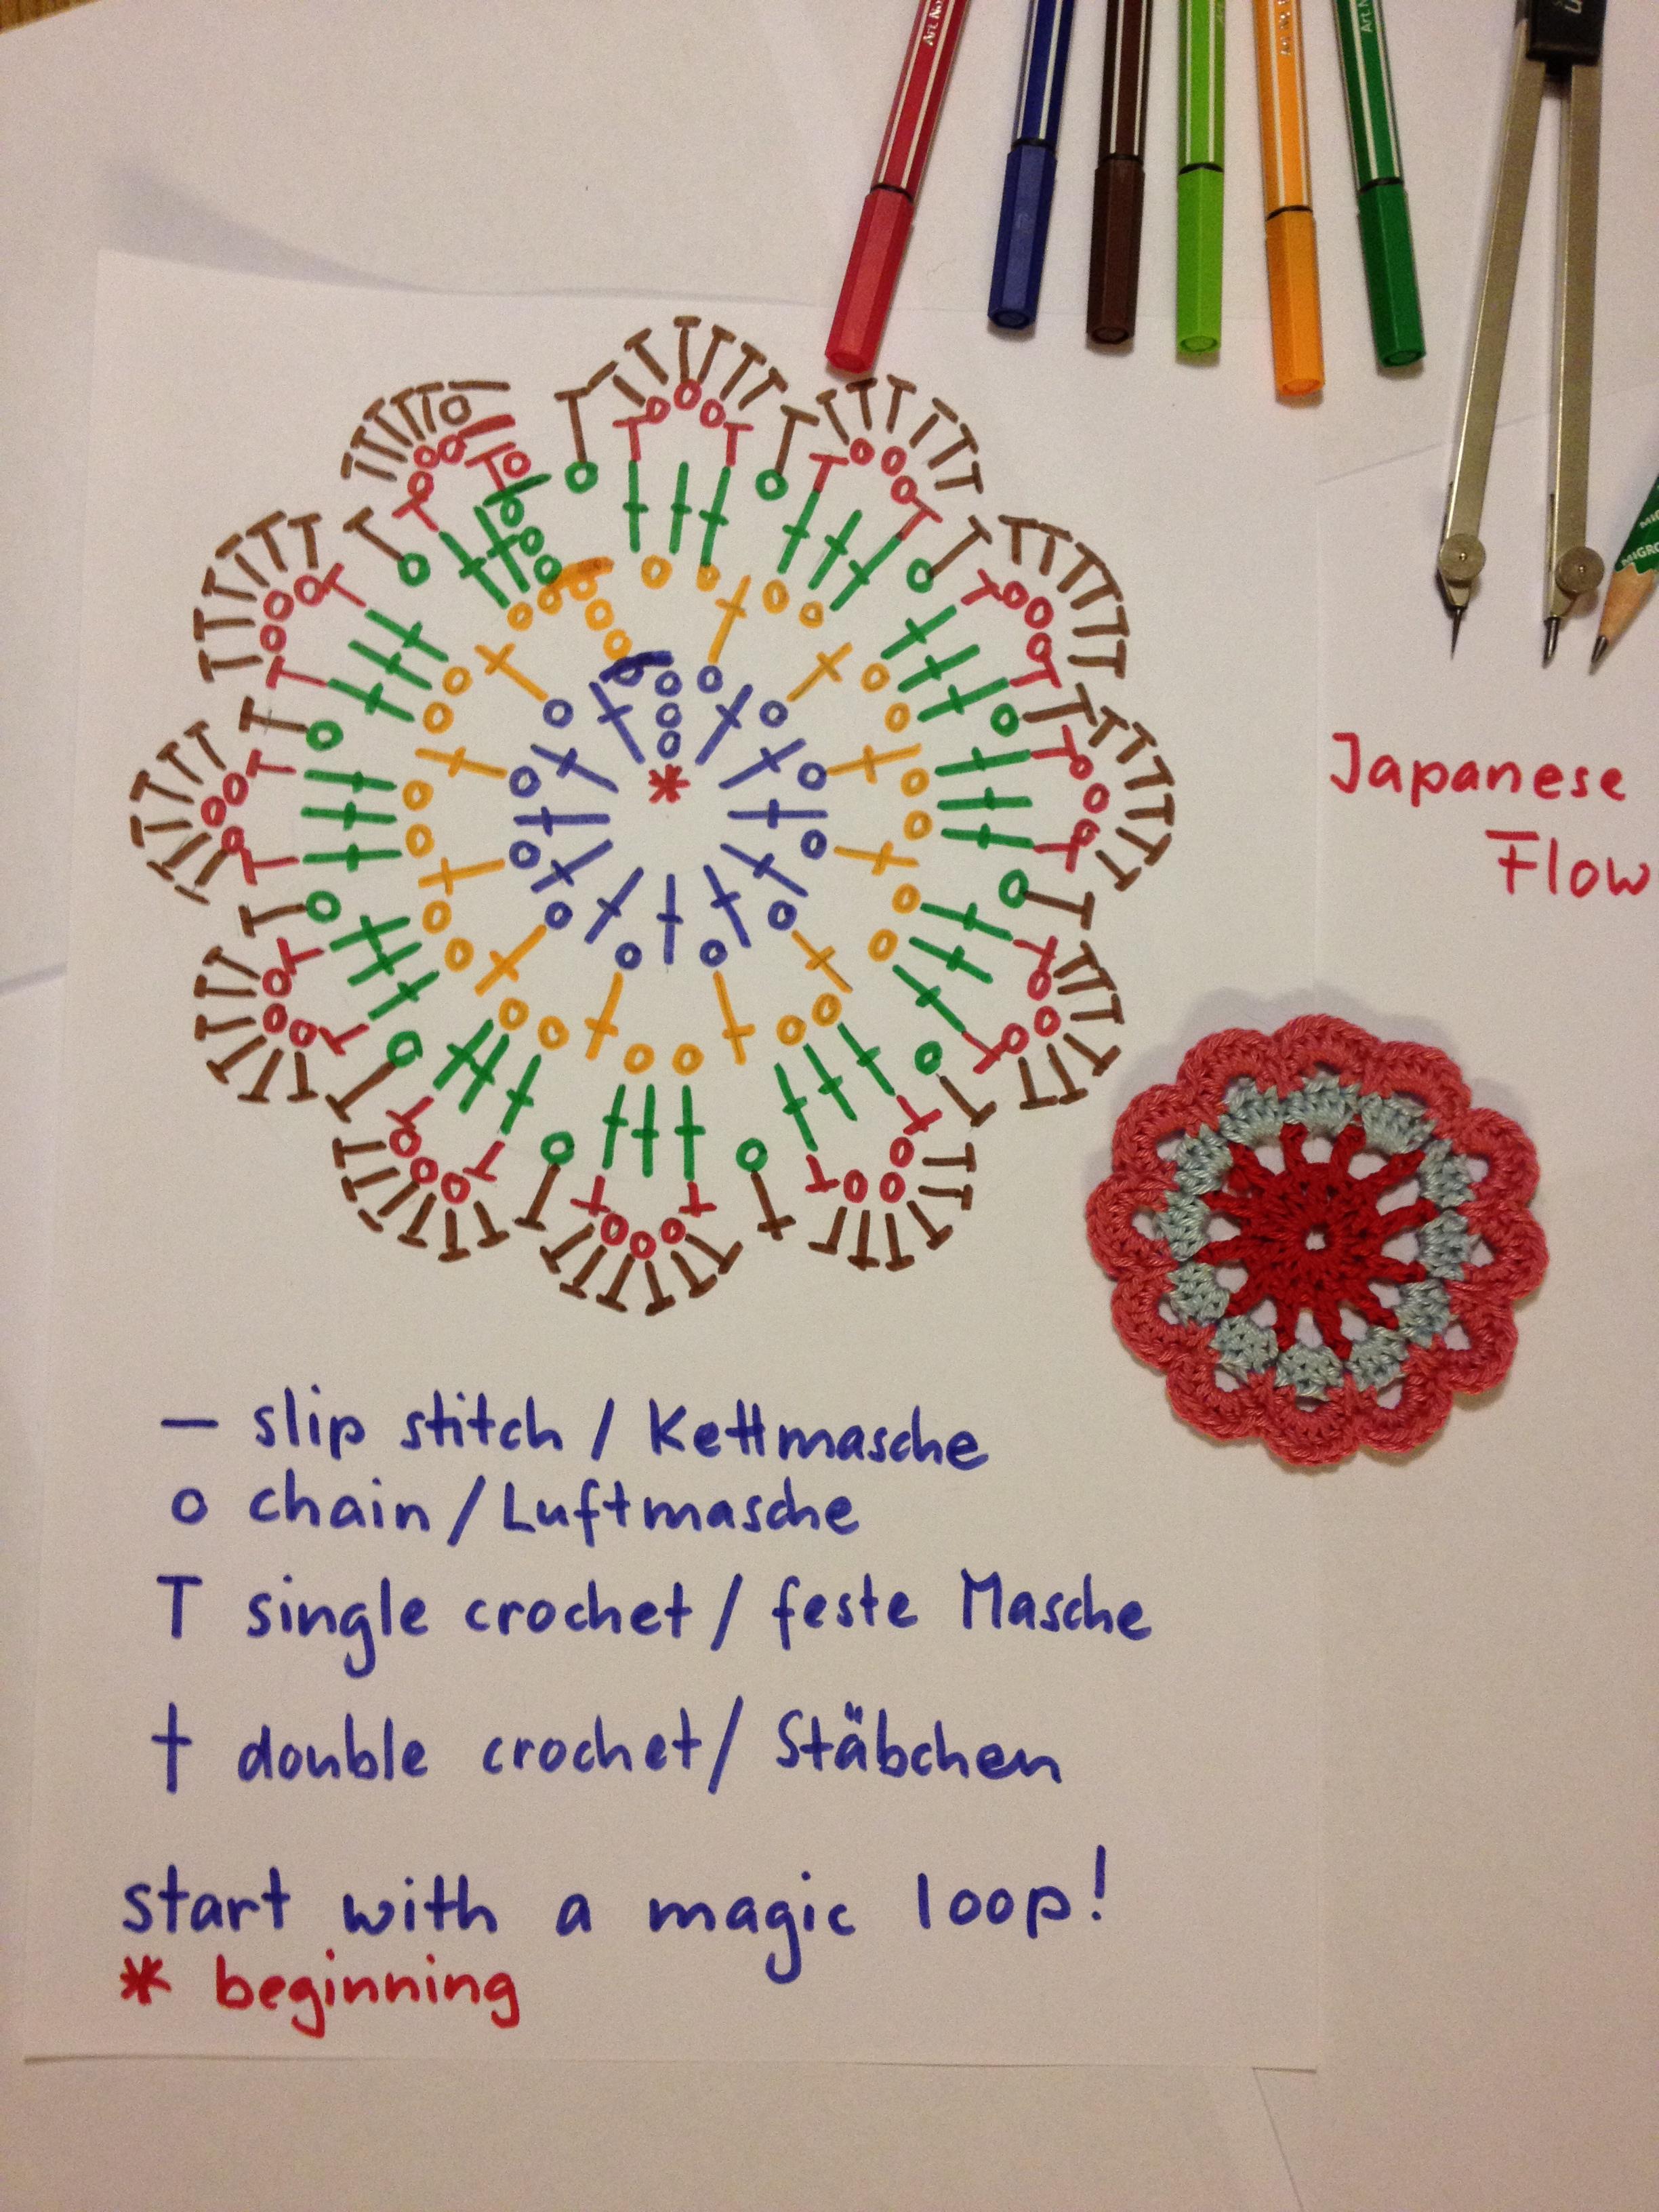 Free Pattern Crochet Japanese Flower : Japanese Flowers Babajezas Wundert?te